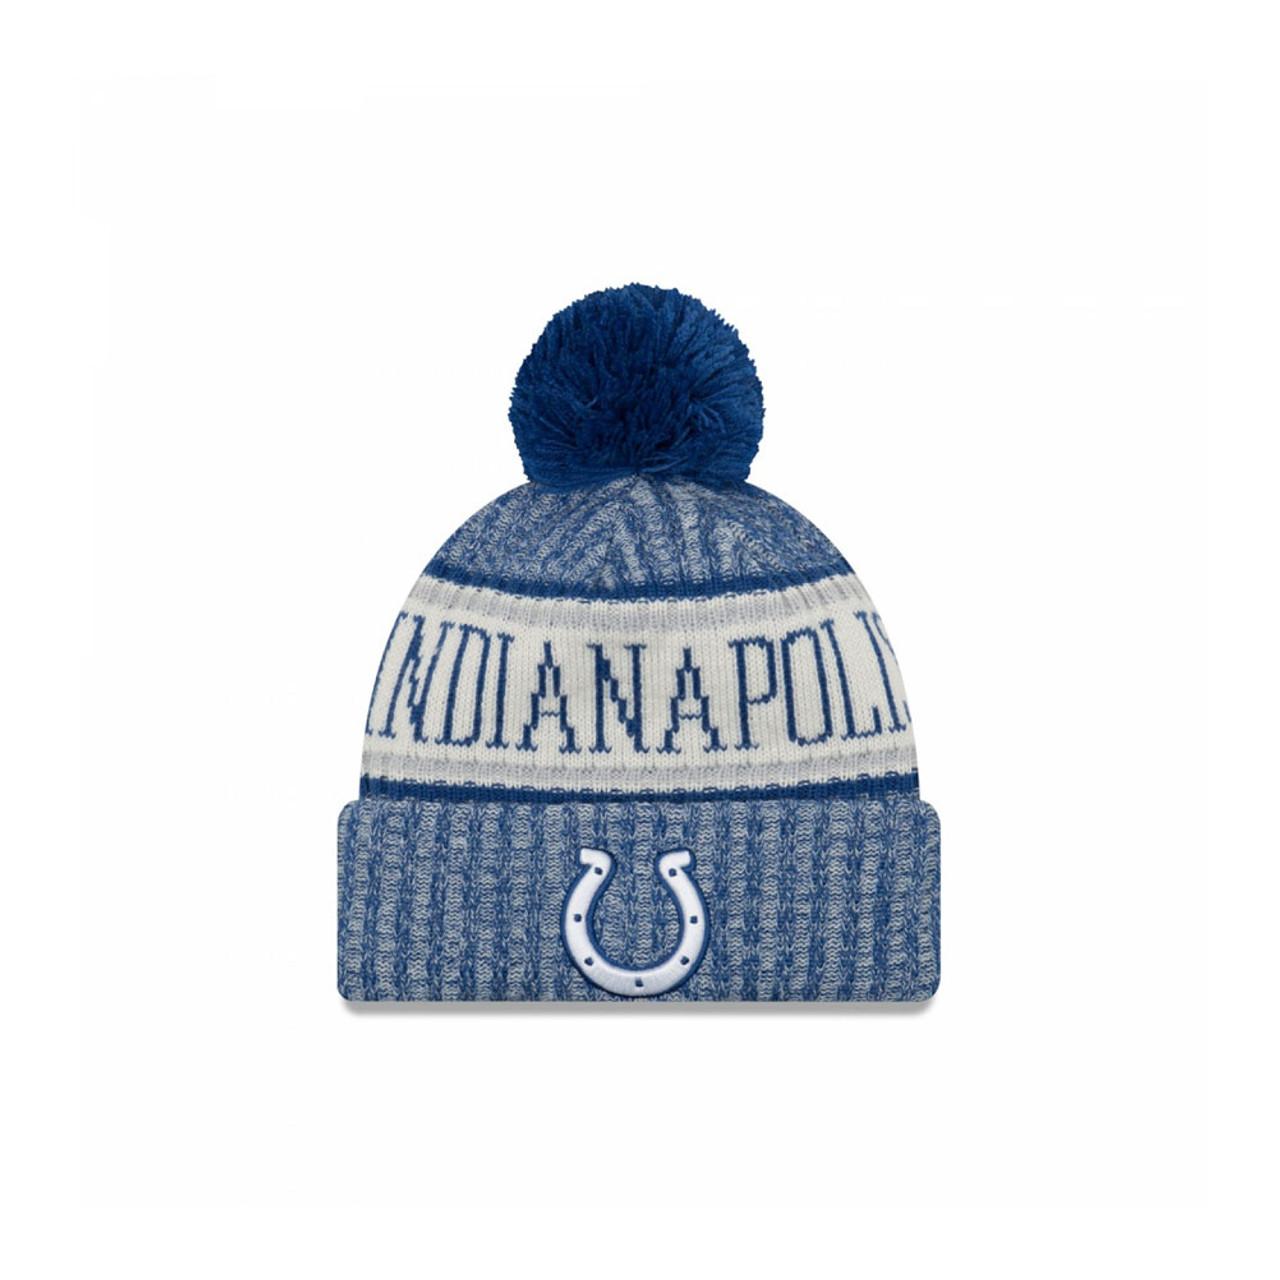 57134cdea45 NEW ERA Indianapolis Colts NFL sideline knit bobble beanie hat  blue